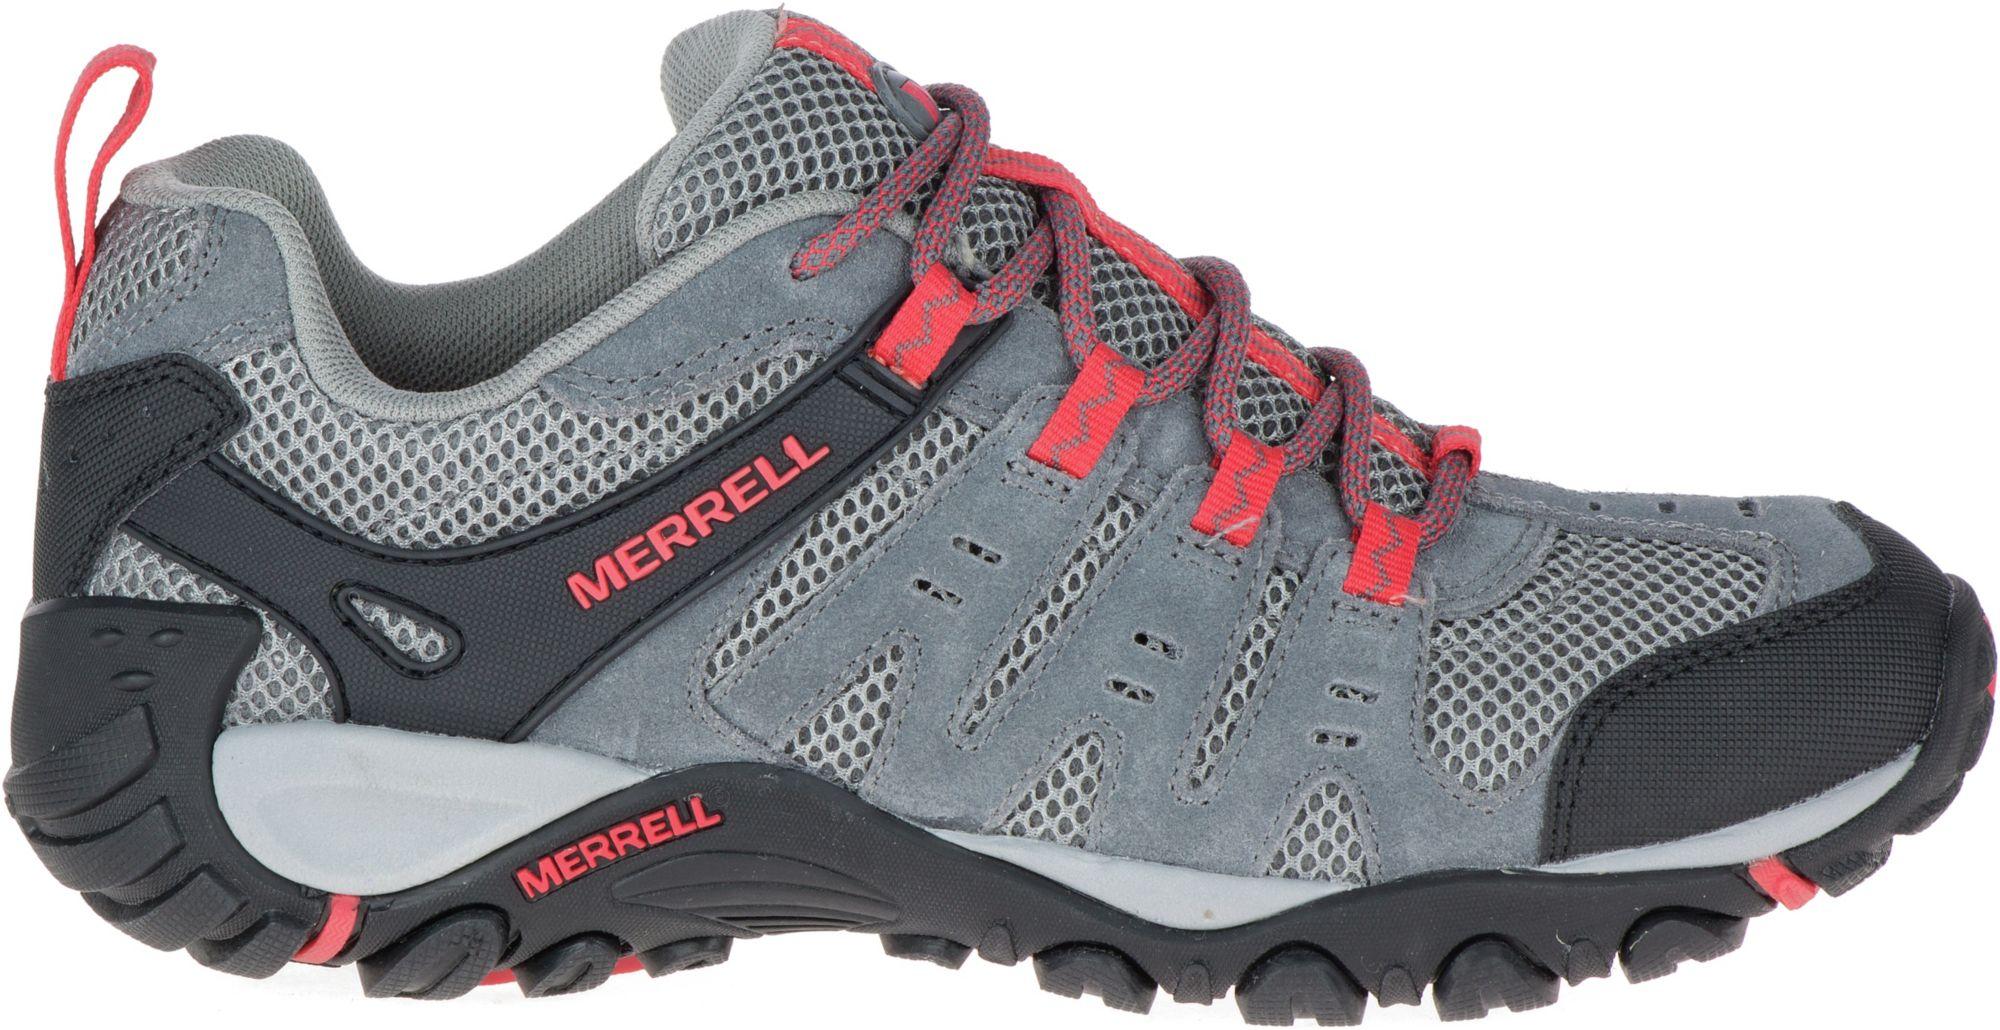 Merrell J358569C Accentor Low Women's Hiking Shoes SZ 9.5